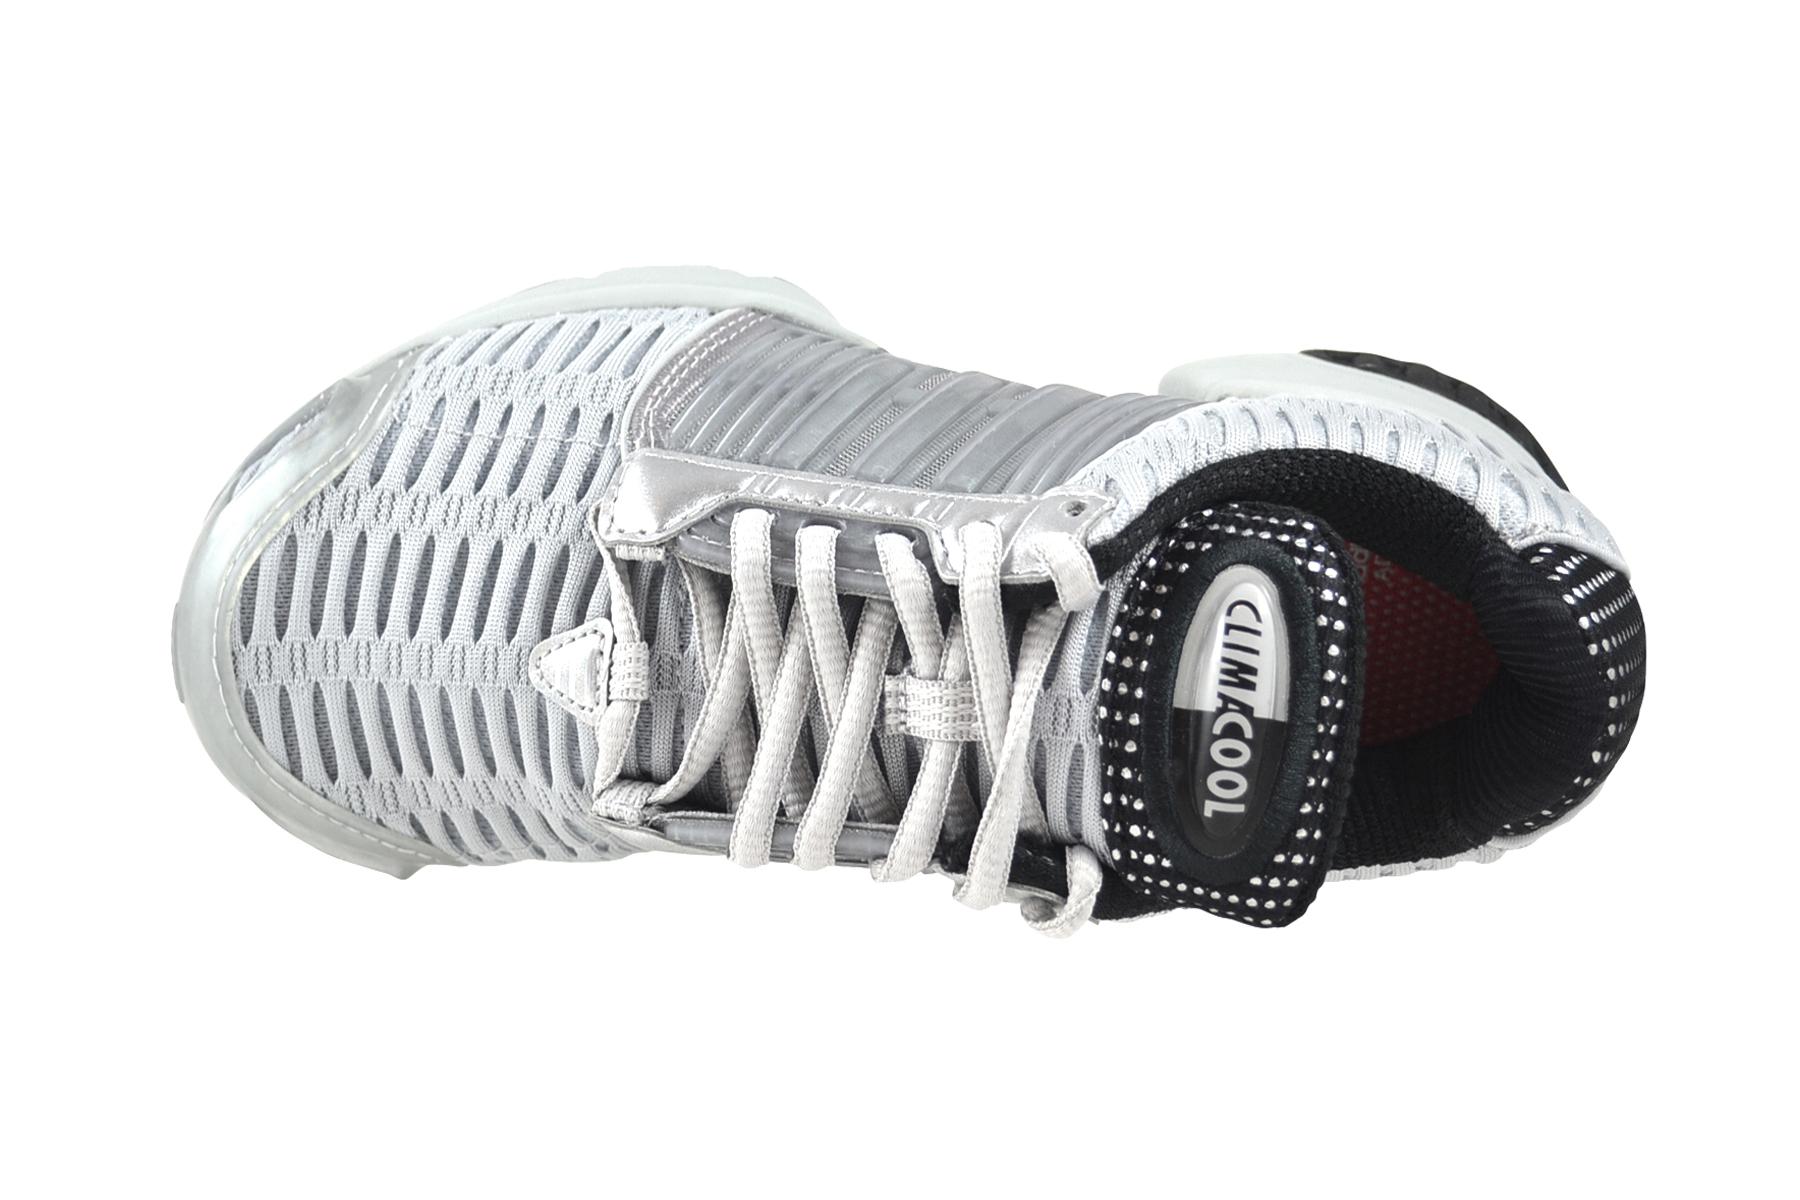 Adidas Clima Cool 1 silver metallicclear onix